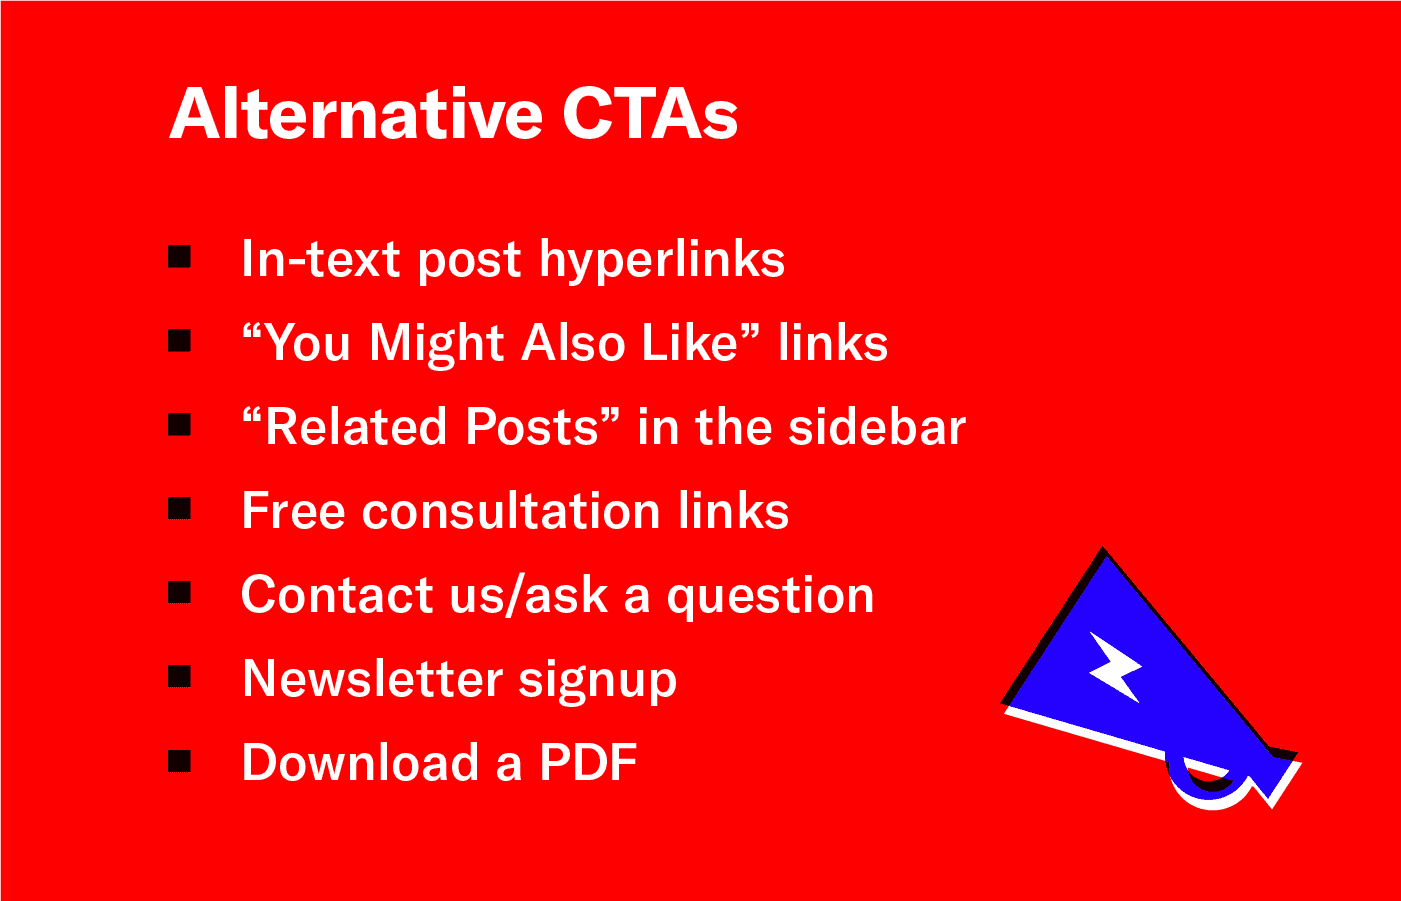 A list of alternative CTA examples.